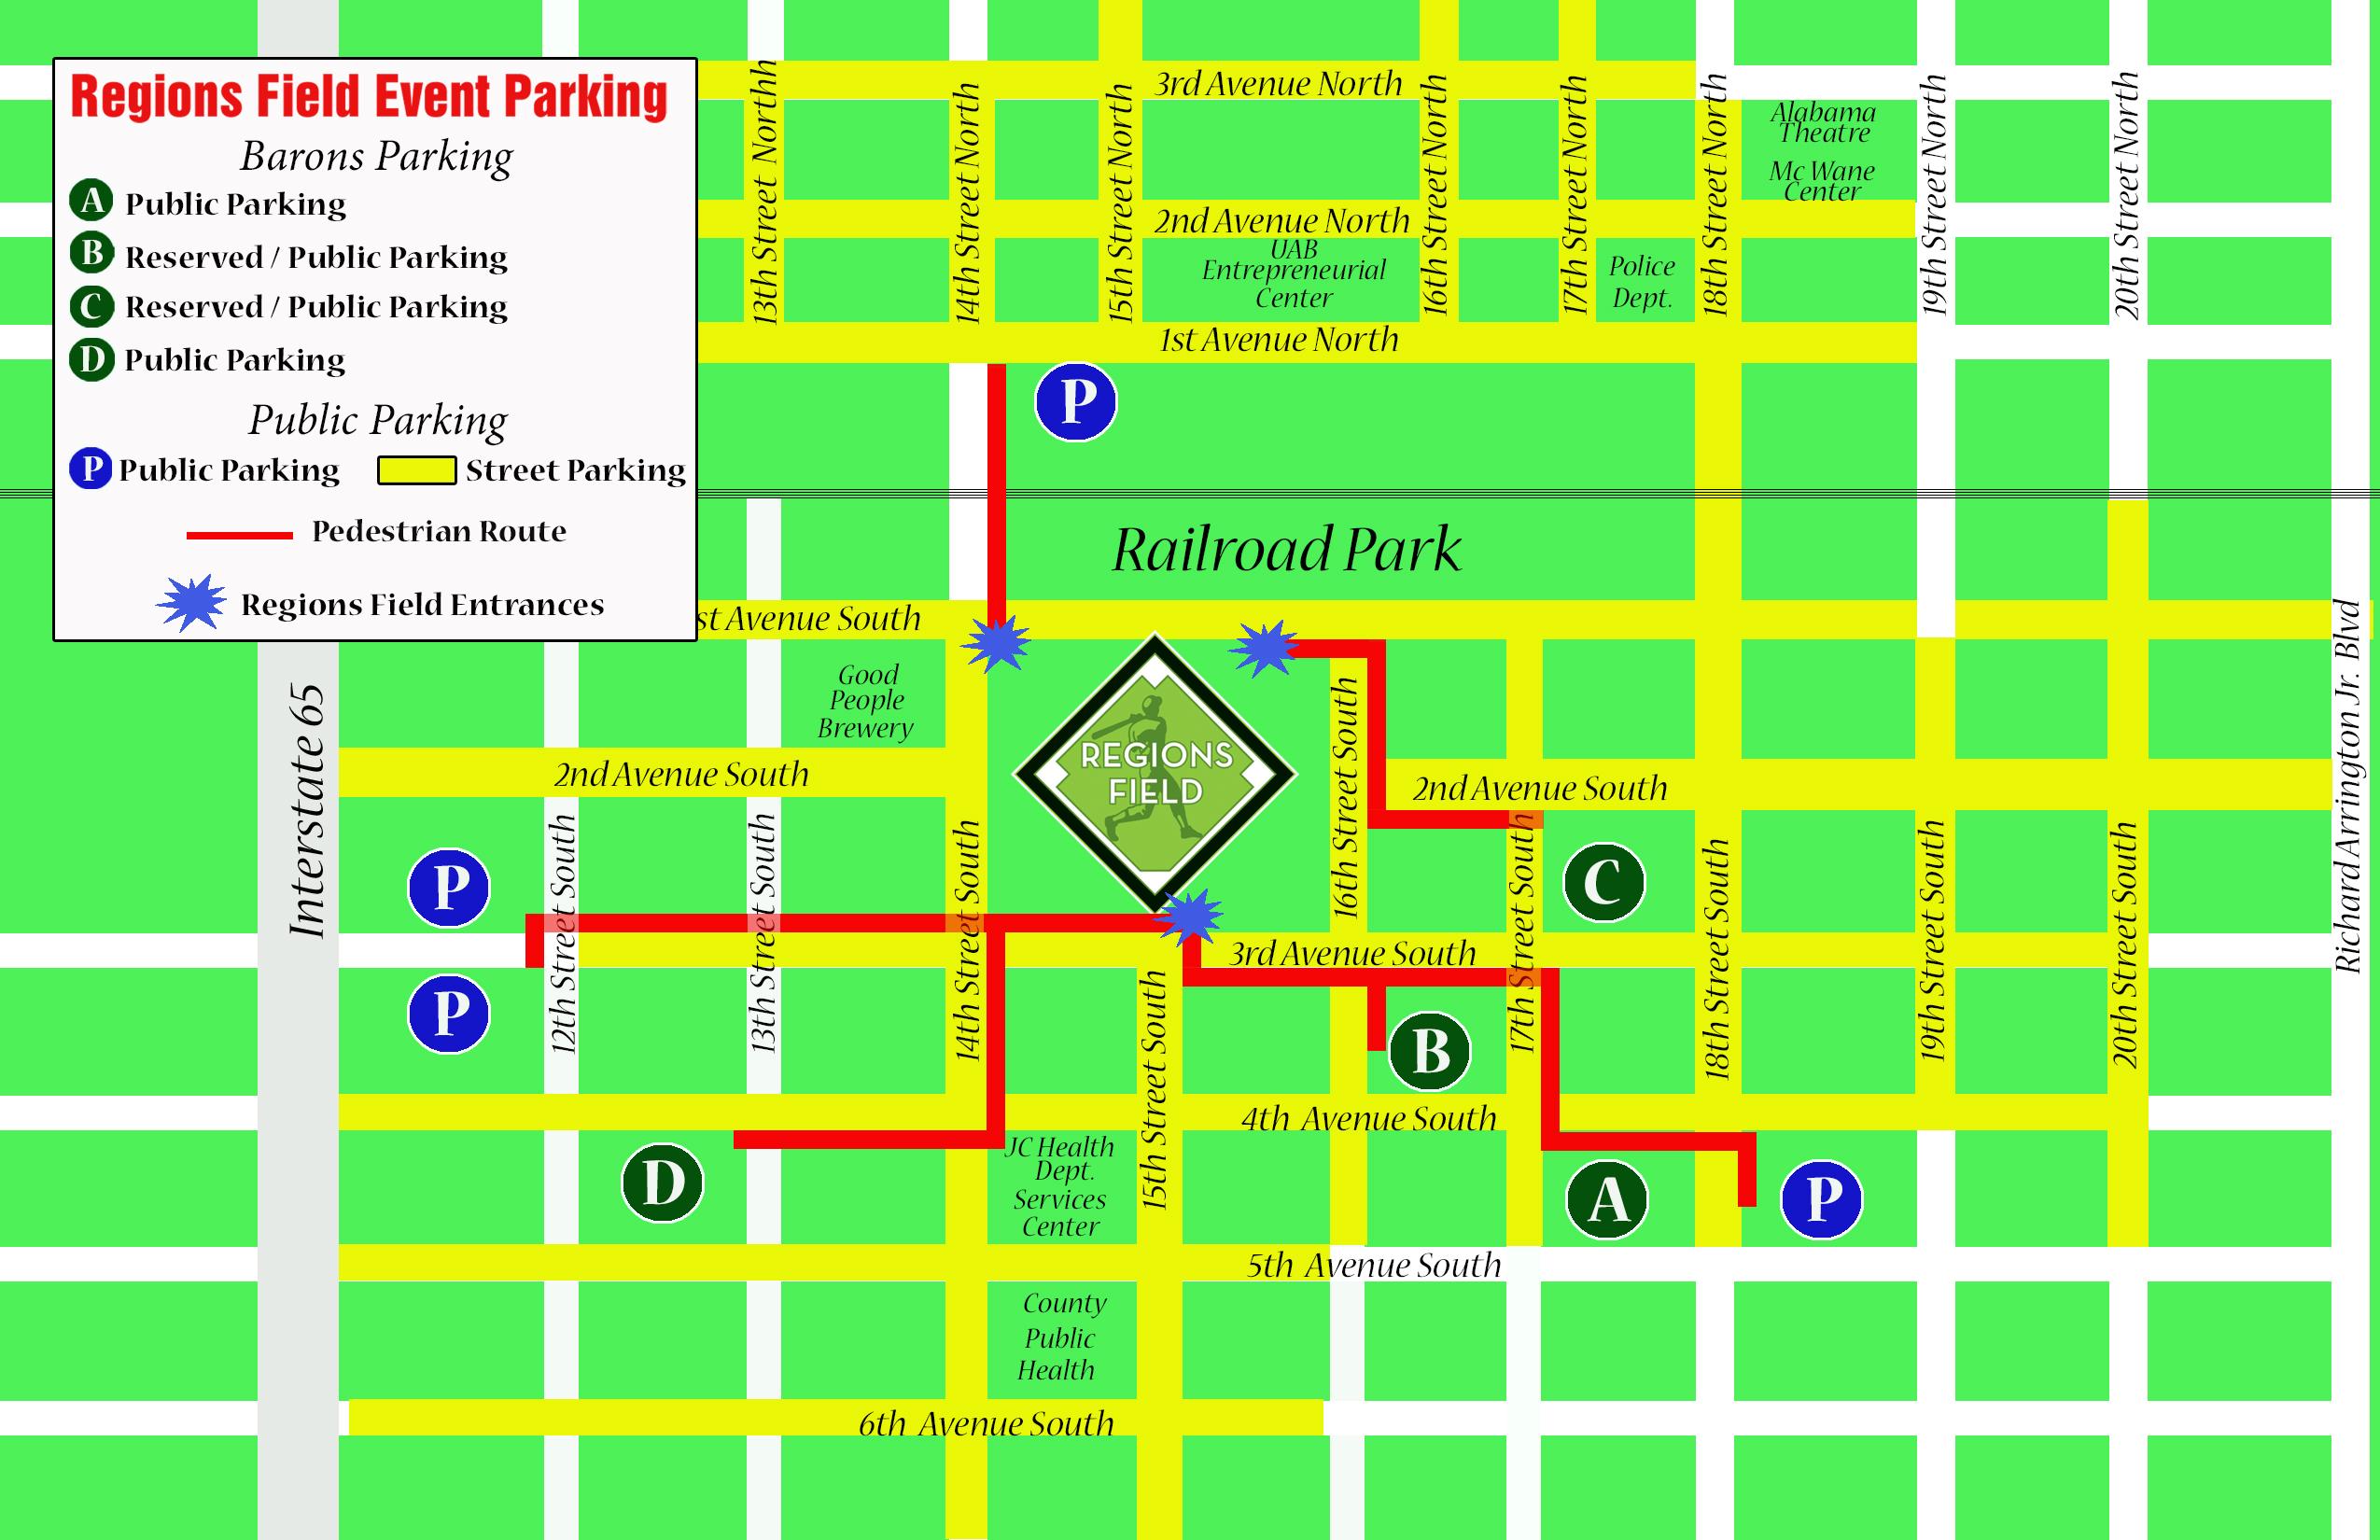 barons' regions field  parking map - httpwwwmilbcomassetsimagesparkingmapqzzuswv